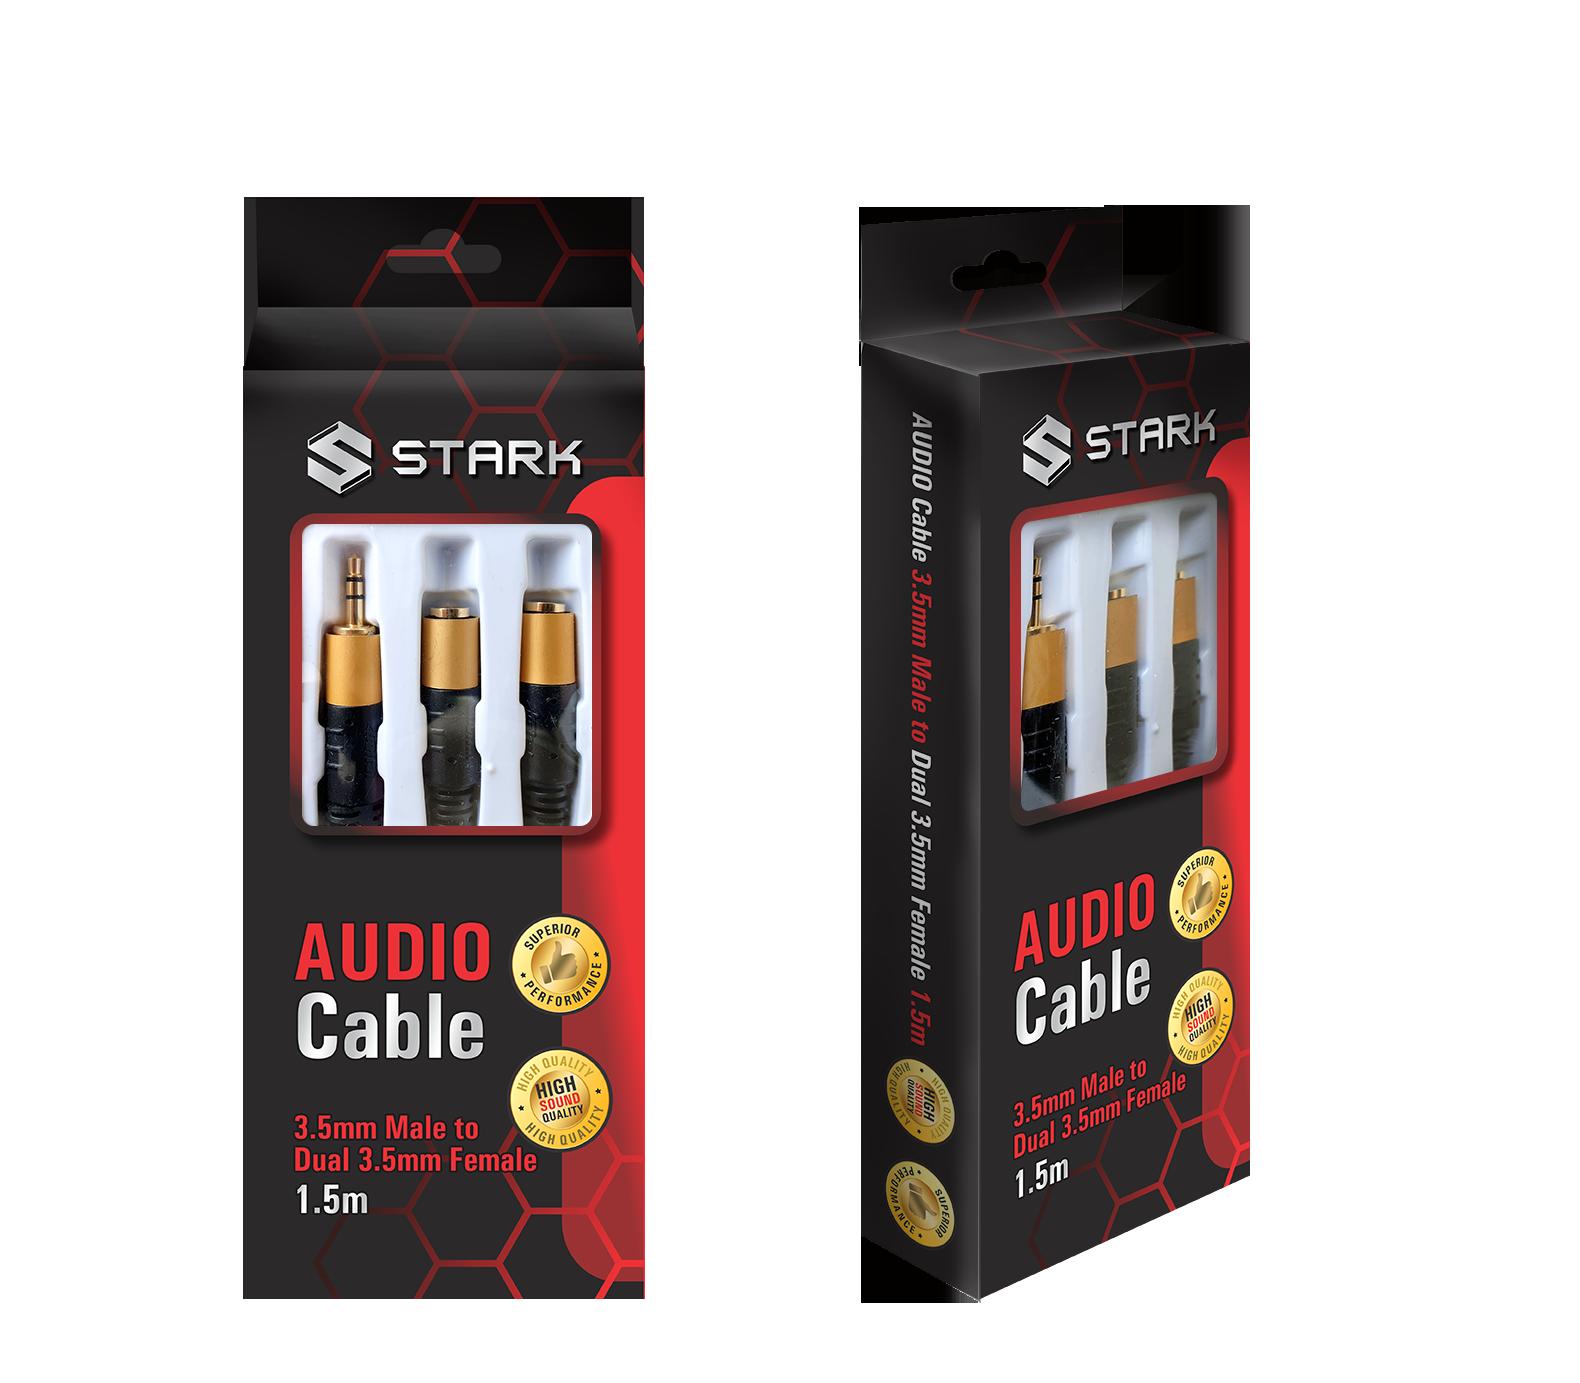 STARK kabl audio 3.5mm stereo na 2X3.5mm stereo 1.5m